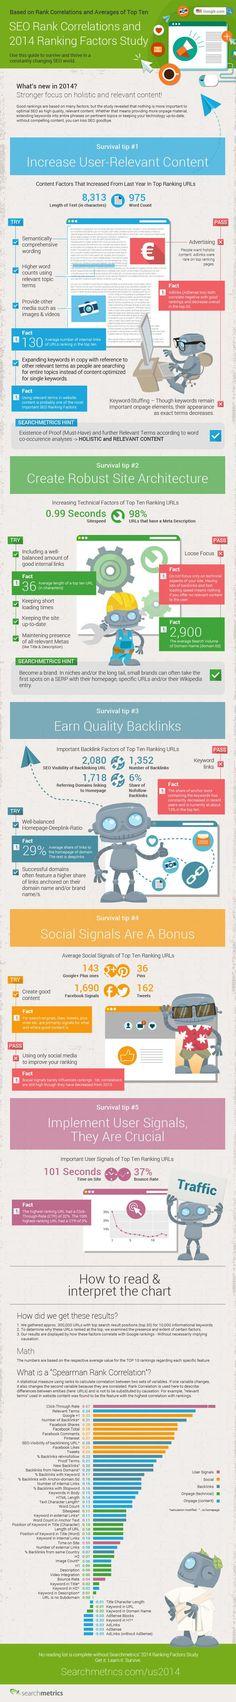 SEO Rank Correlations And Ranking Factors 2014 - #infographic #seo #socialmedia #Googleplus